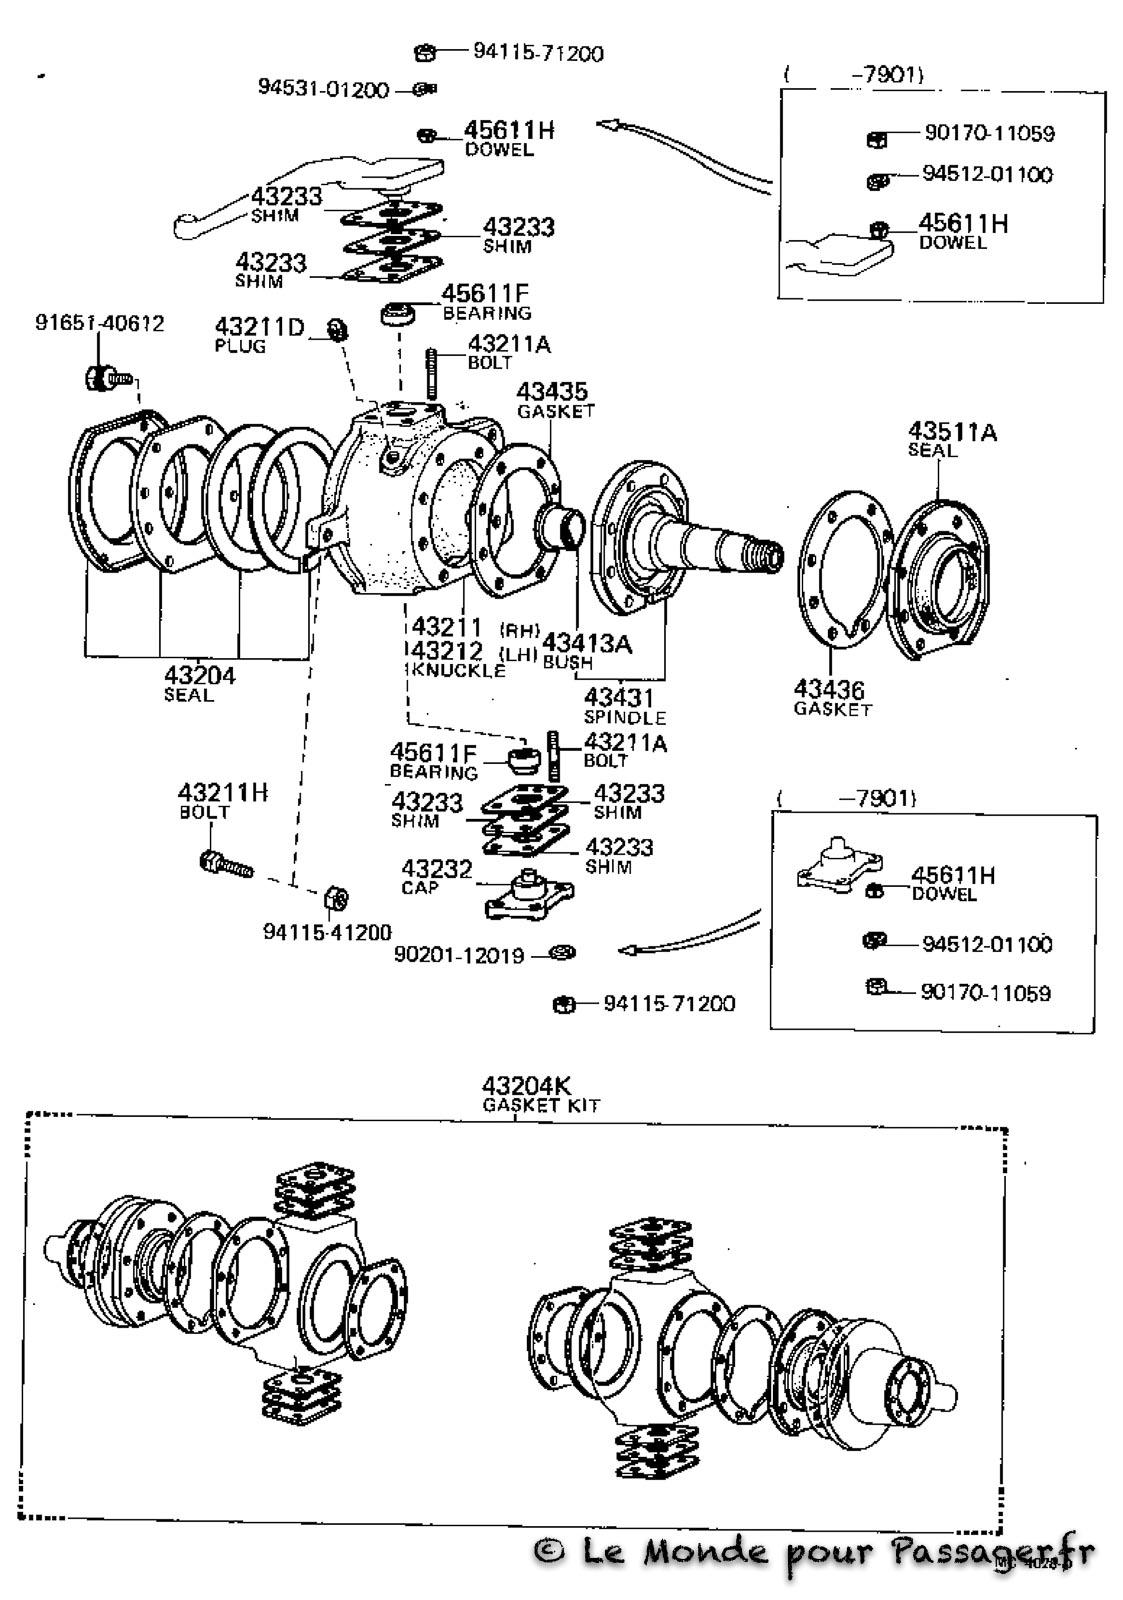 Fj55-Eclatés-Techniques117